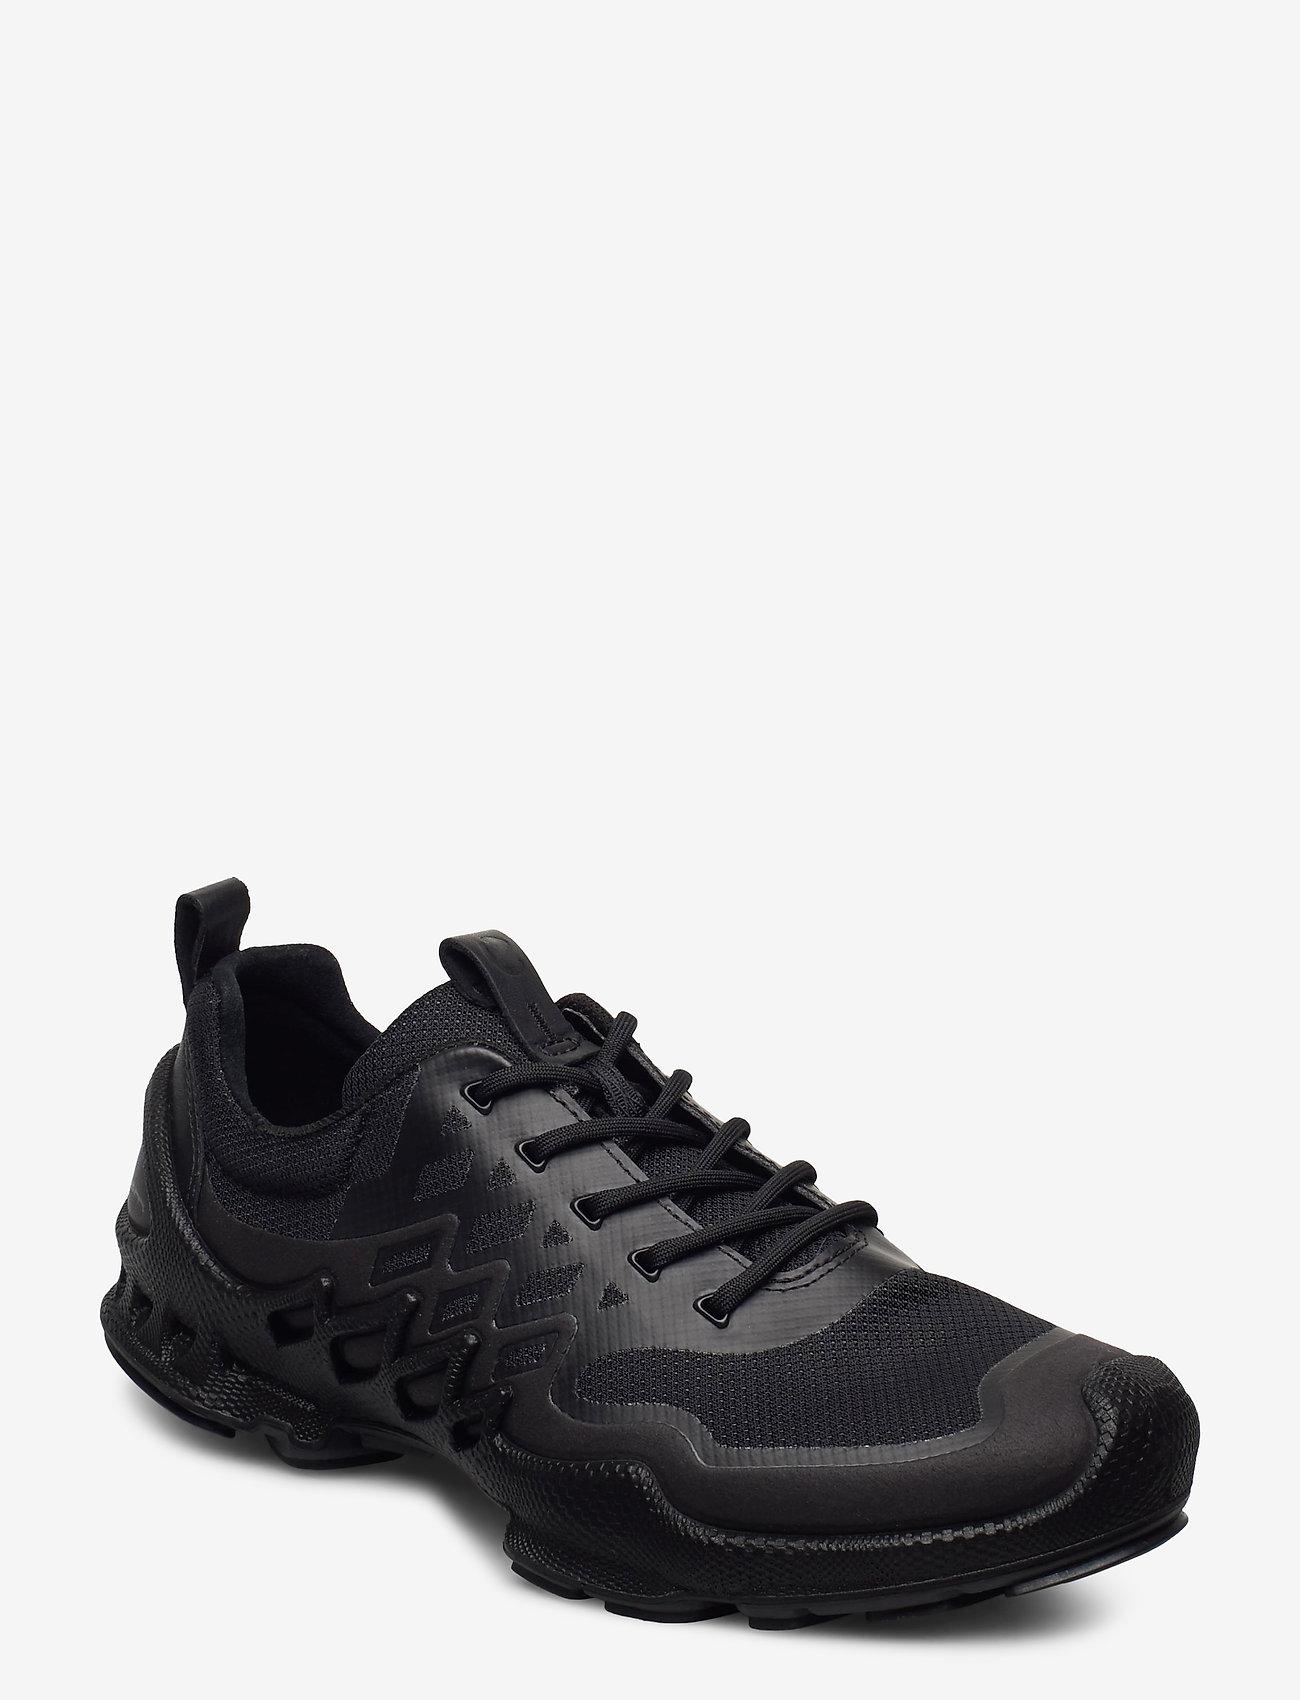 Biom Aex W (Black/black) (105 €) - ECCO